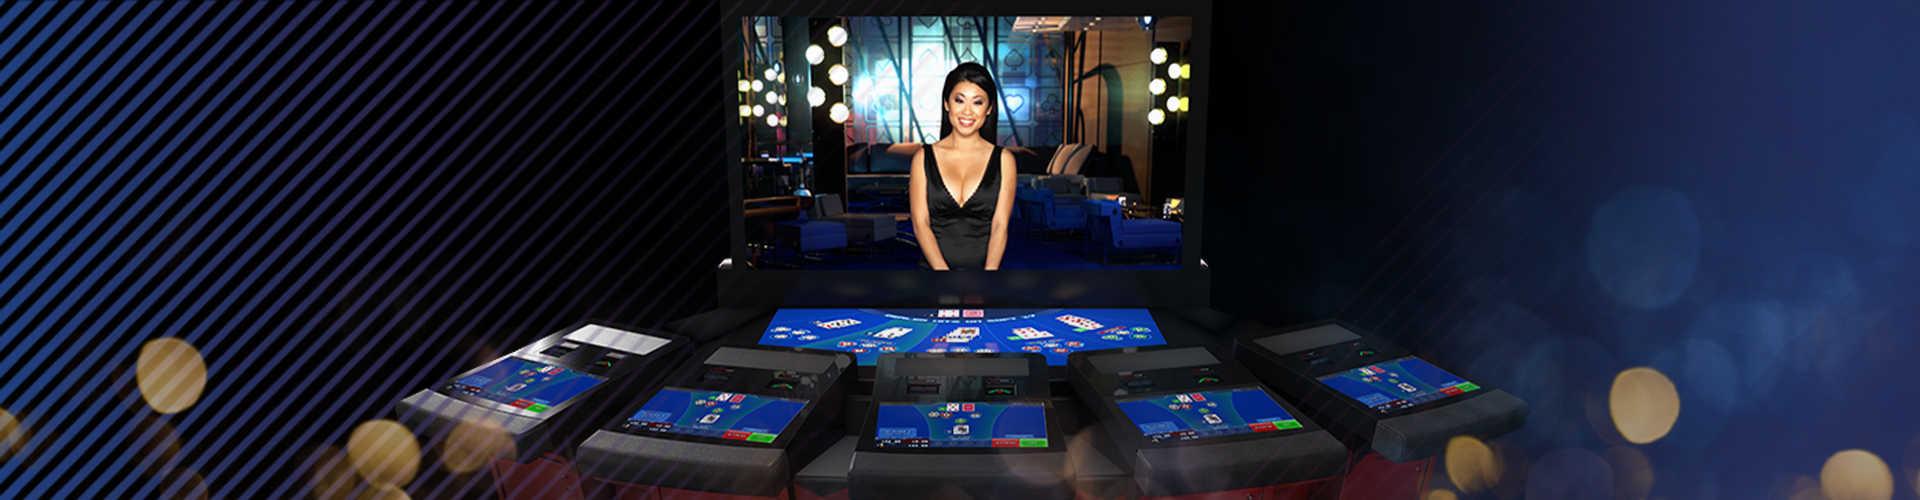 Online Casino Poker Games